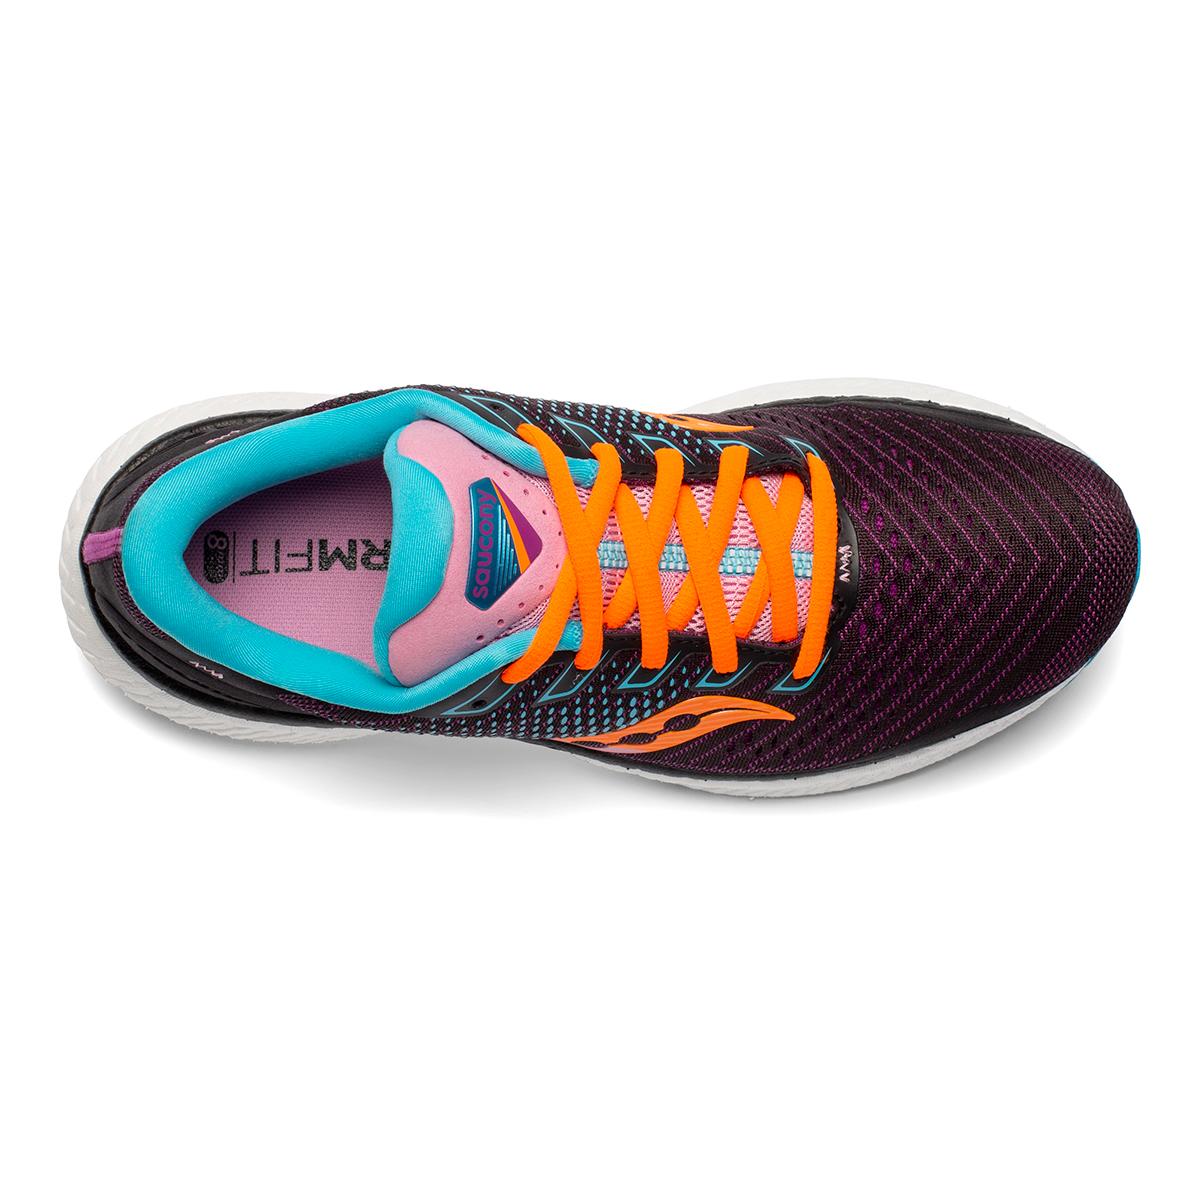 Women's Saucony Triumph 18 Running Shoe - Color: Future/Black - Size: 5 - Width: Regular, Future/Black, large, image 3